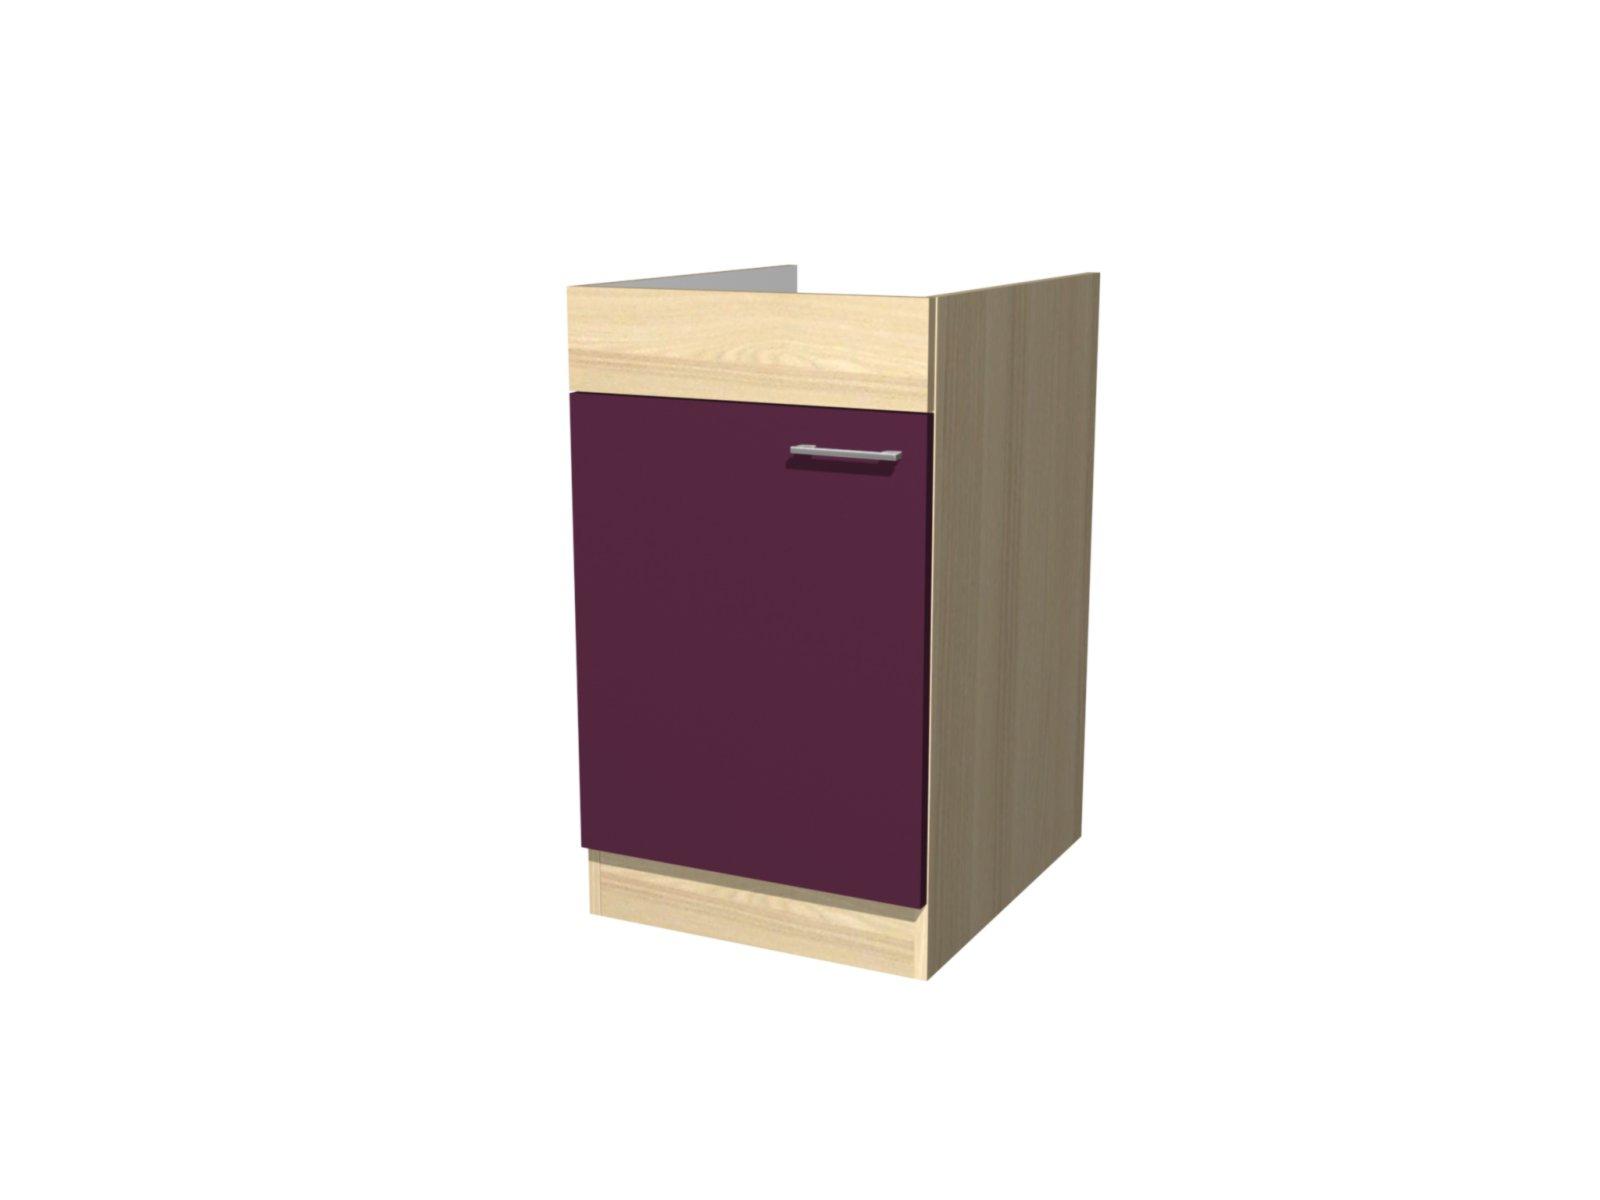 sp lenunterschrank focus akazie aubergine 50 cm sp lenunterschr nke einzelschr nke. Black Bedroom Furniture Sets. Home Design Ideas